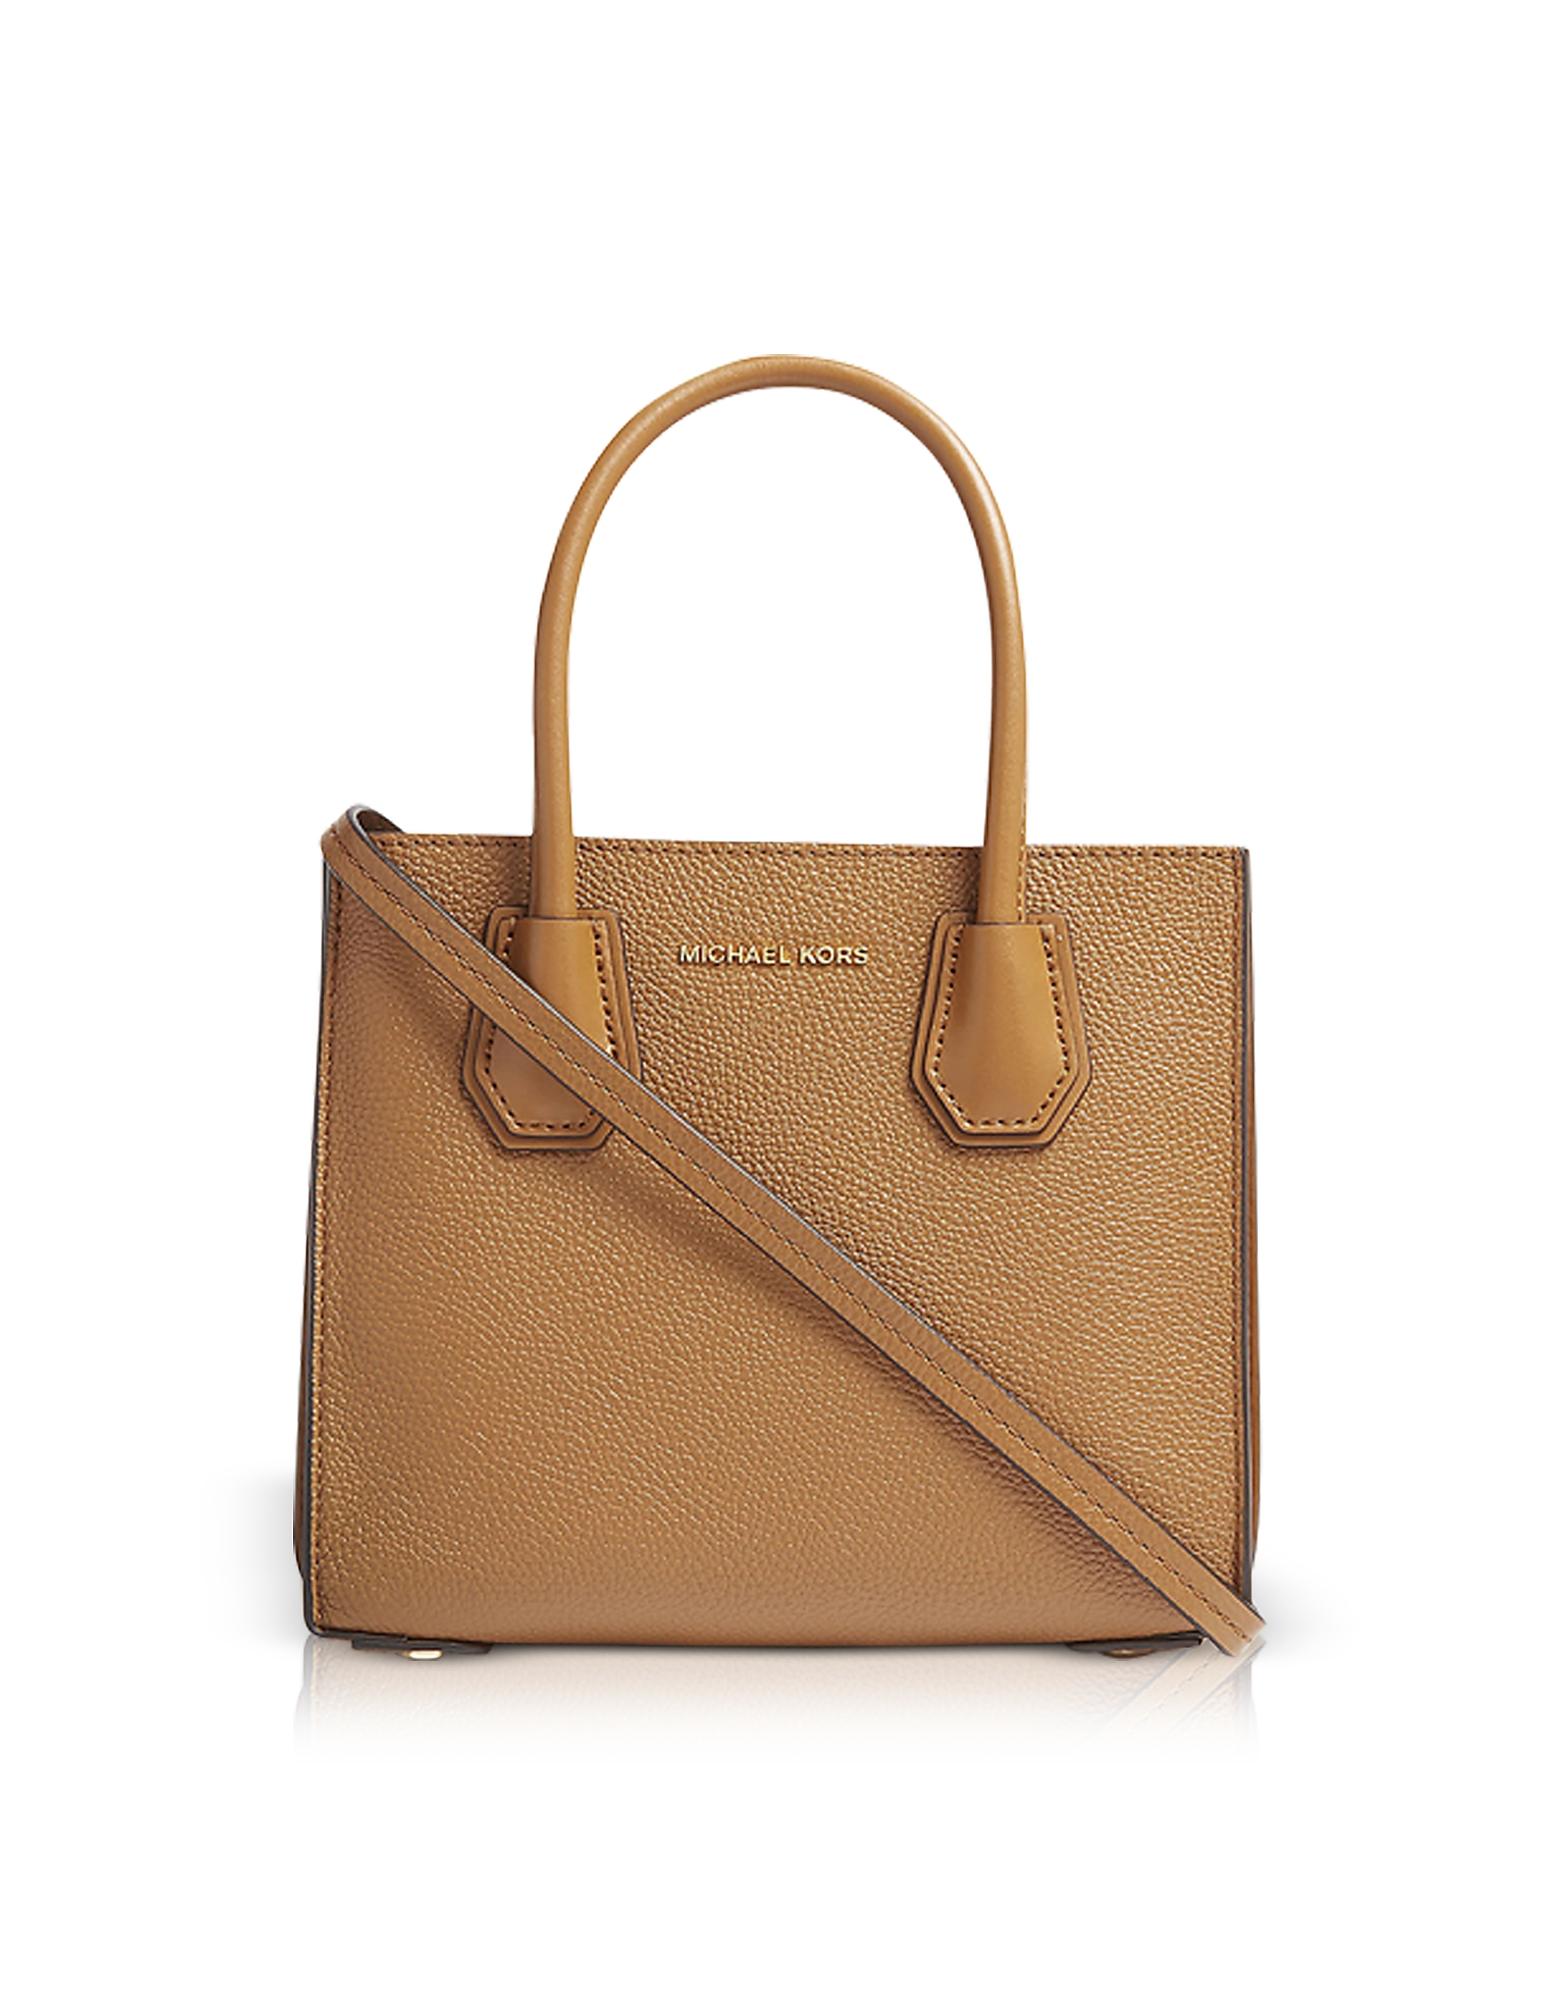 Michael Kors Handbags, Mercer Pebbled Leather Accordion Crossbody